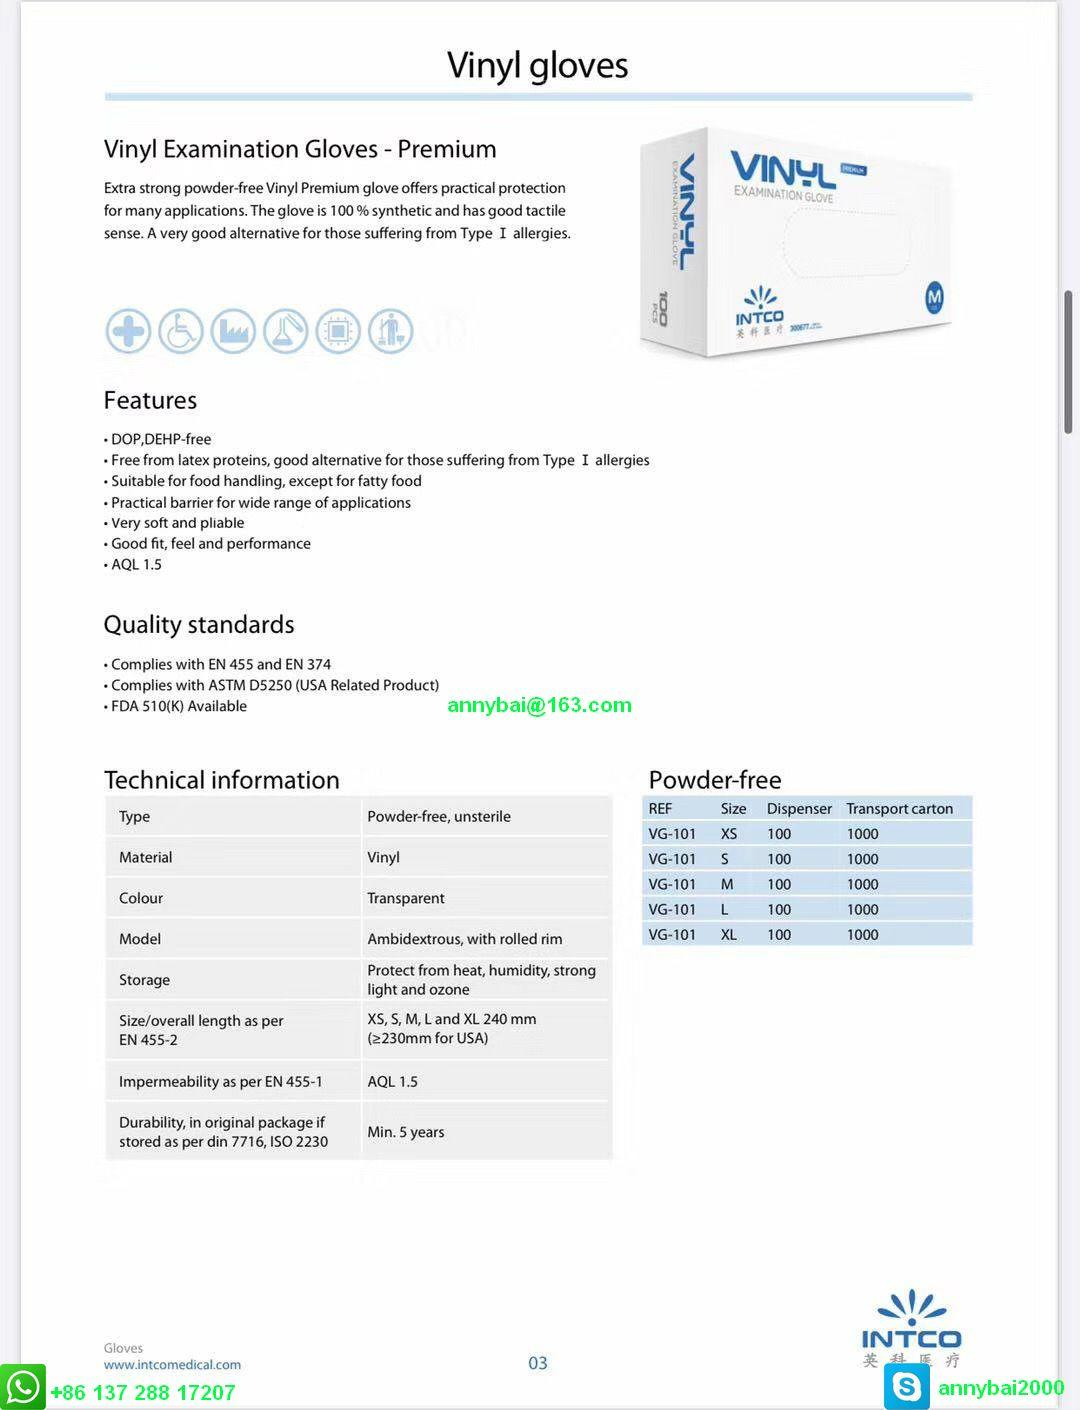 Disposable VINYL Examination Gloves against Coronavirus with CE  11